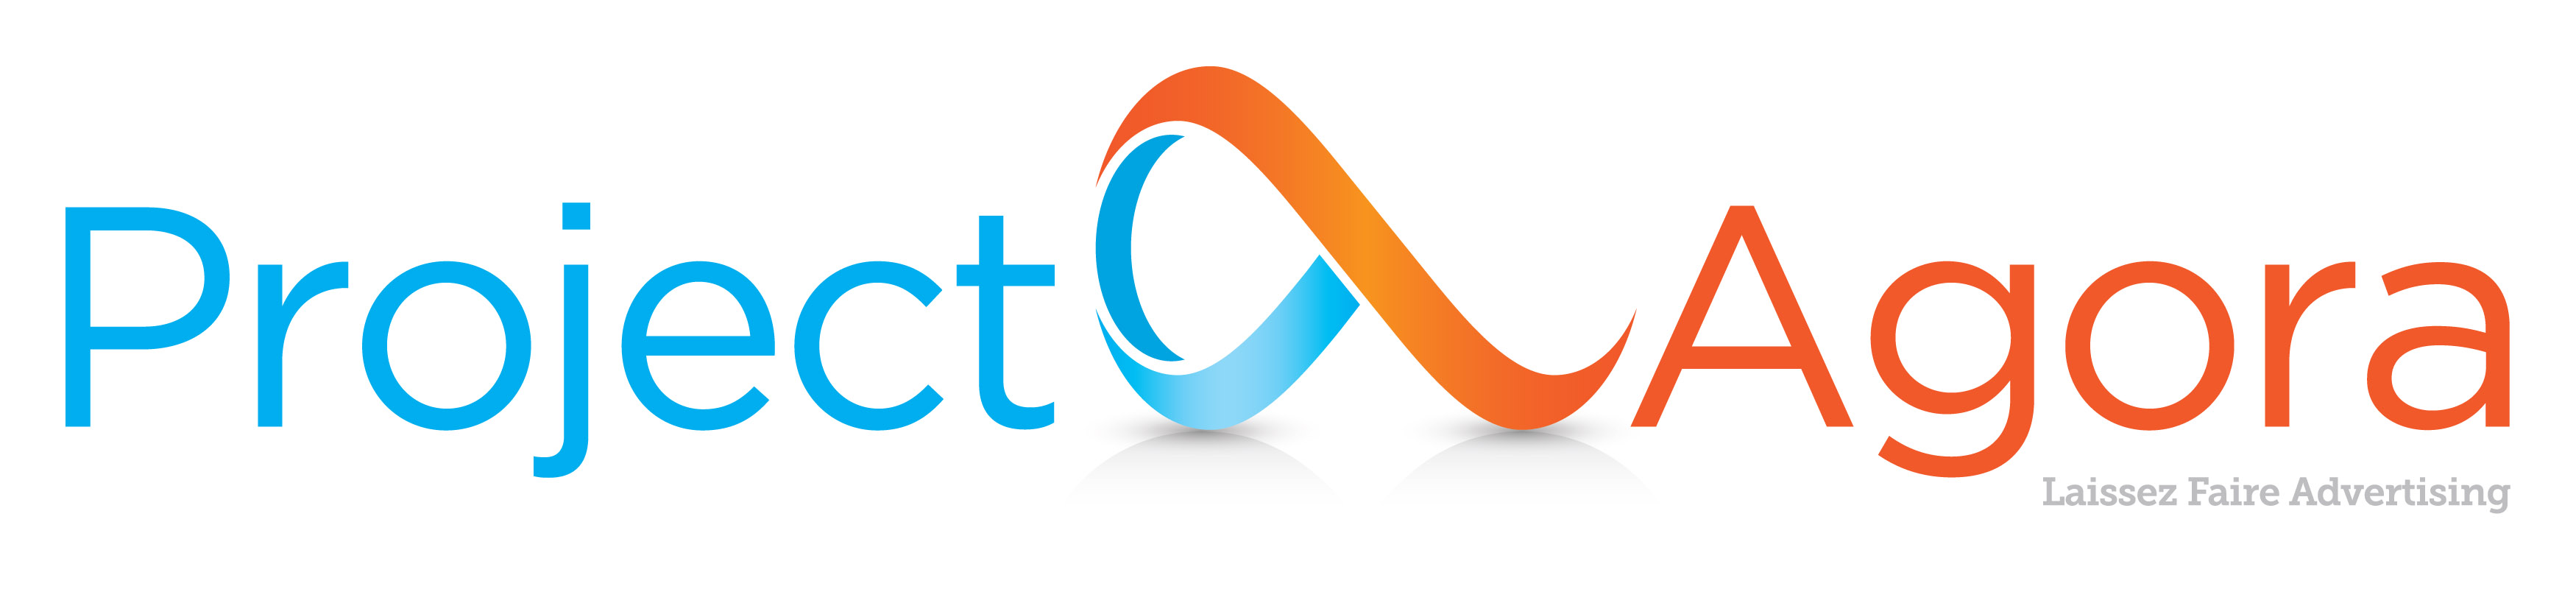 Project Agora logo